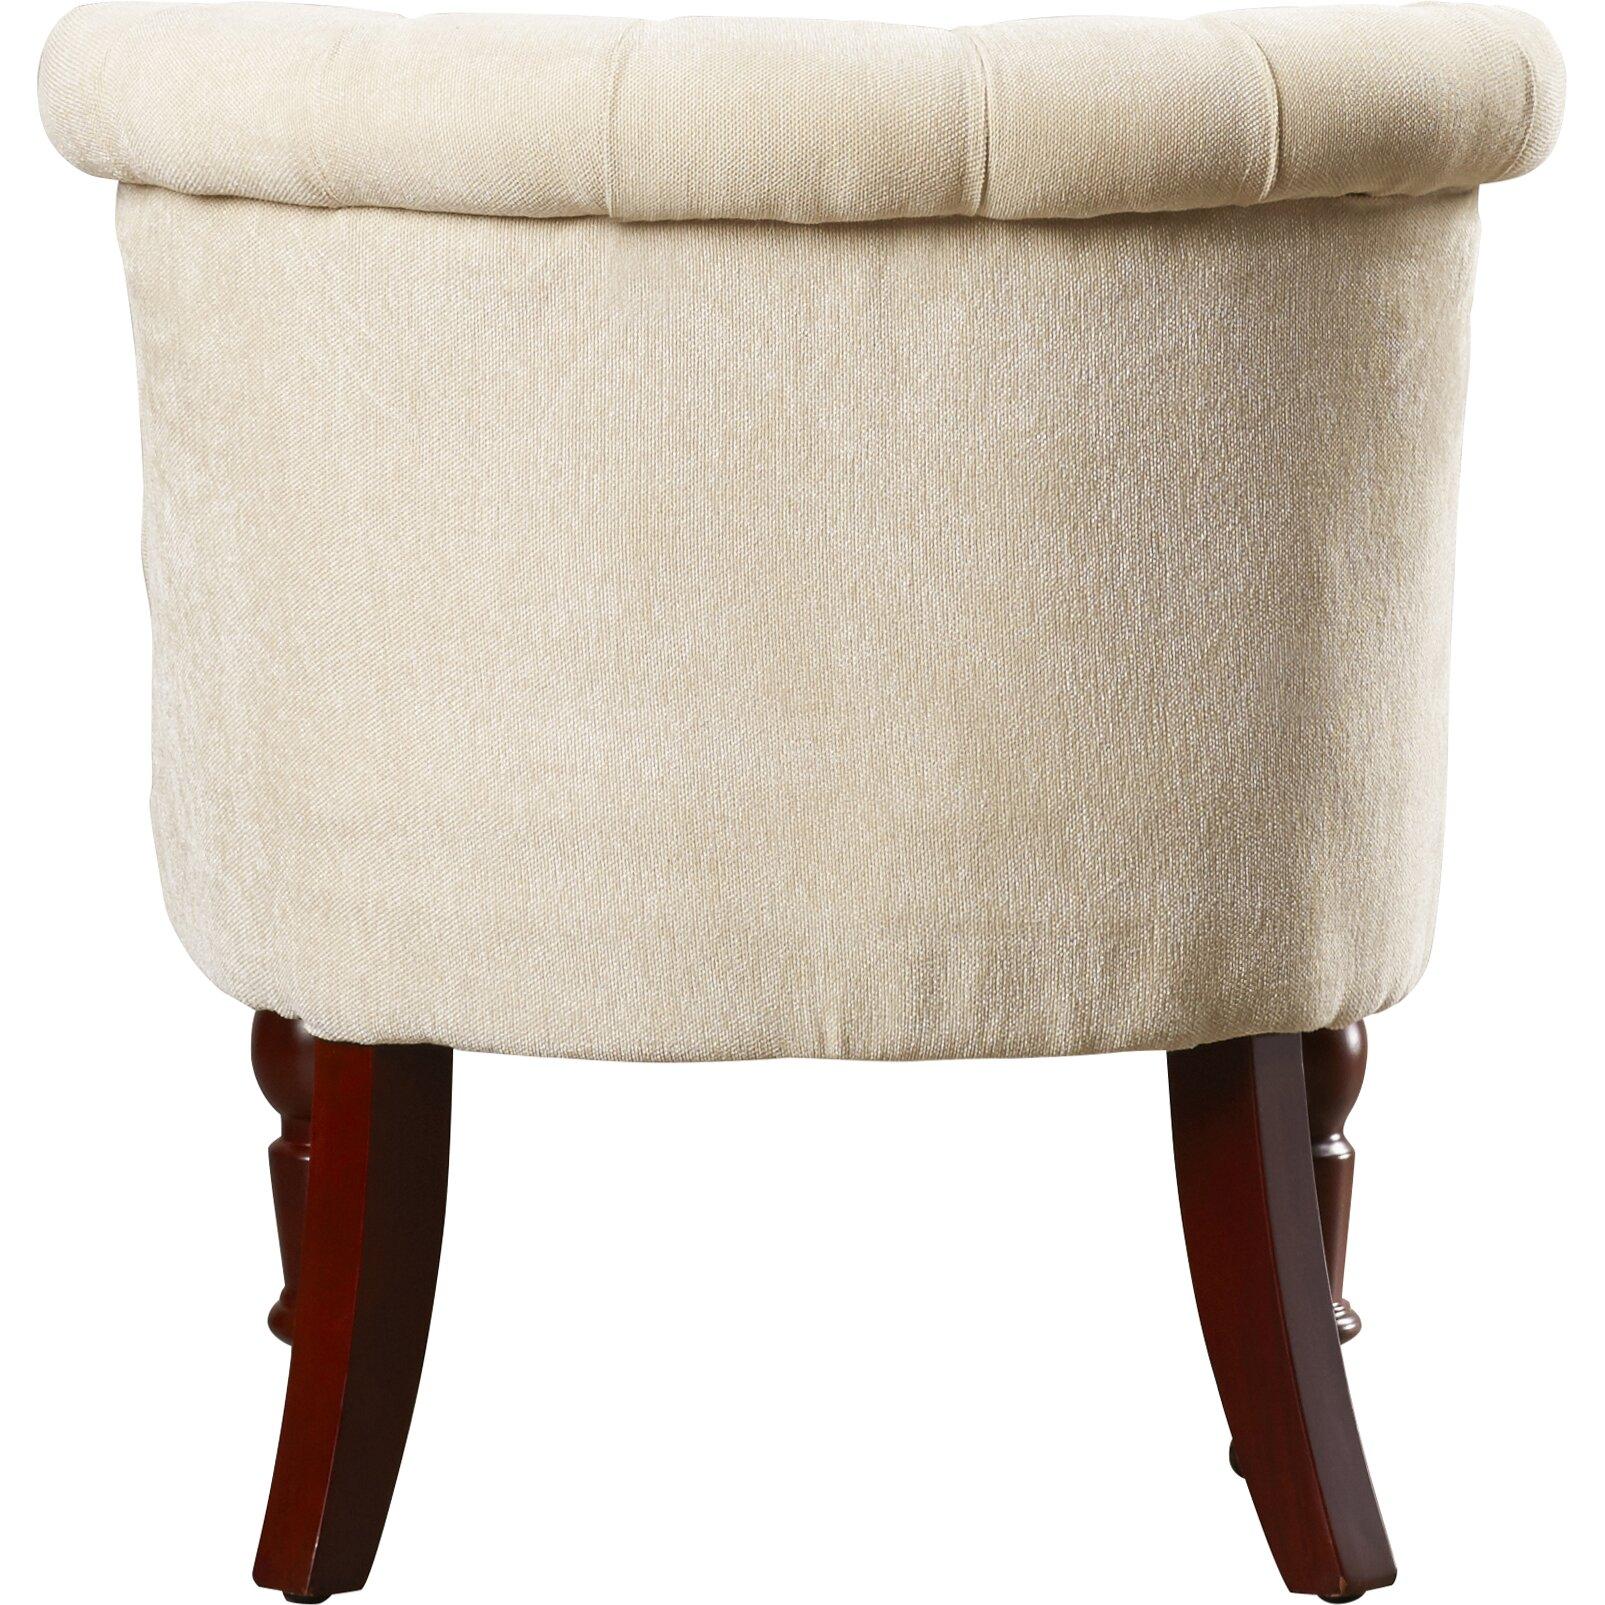 Three Posts Madrid Tufted Fabric Slipper Chair Reviews Wayfair